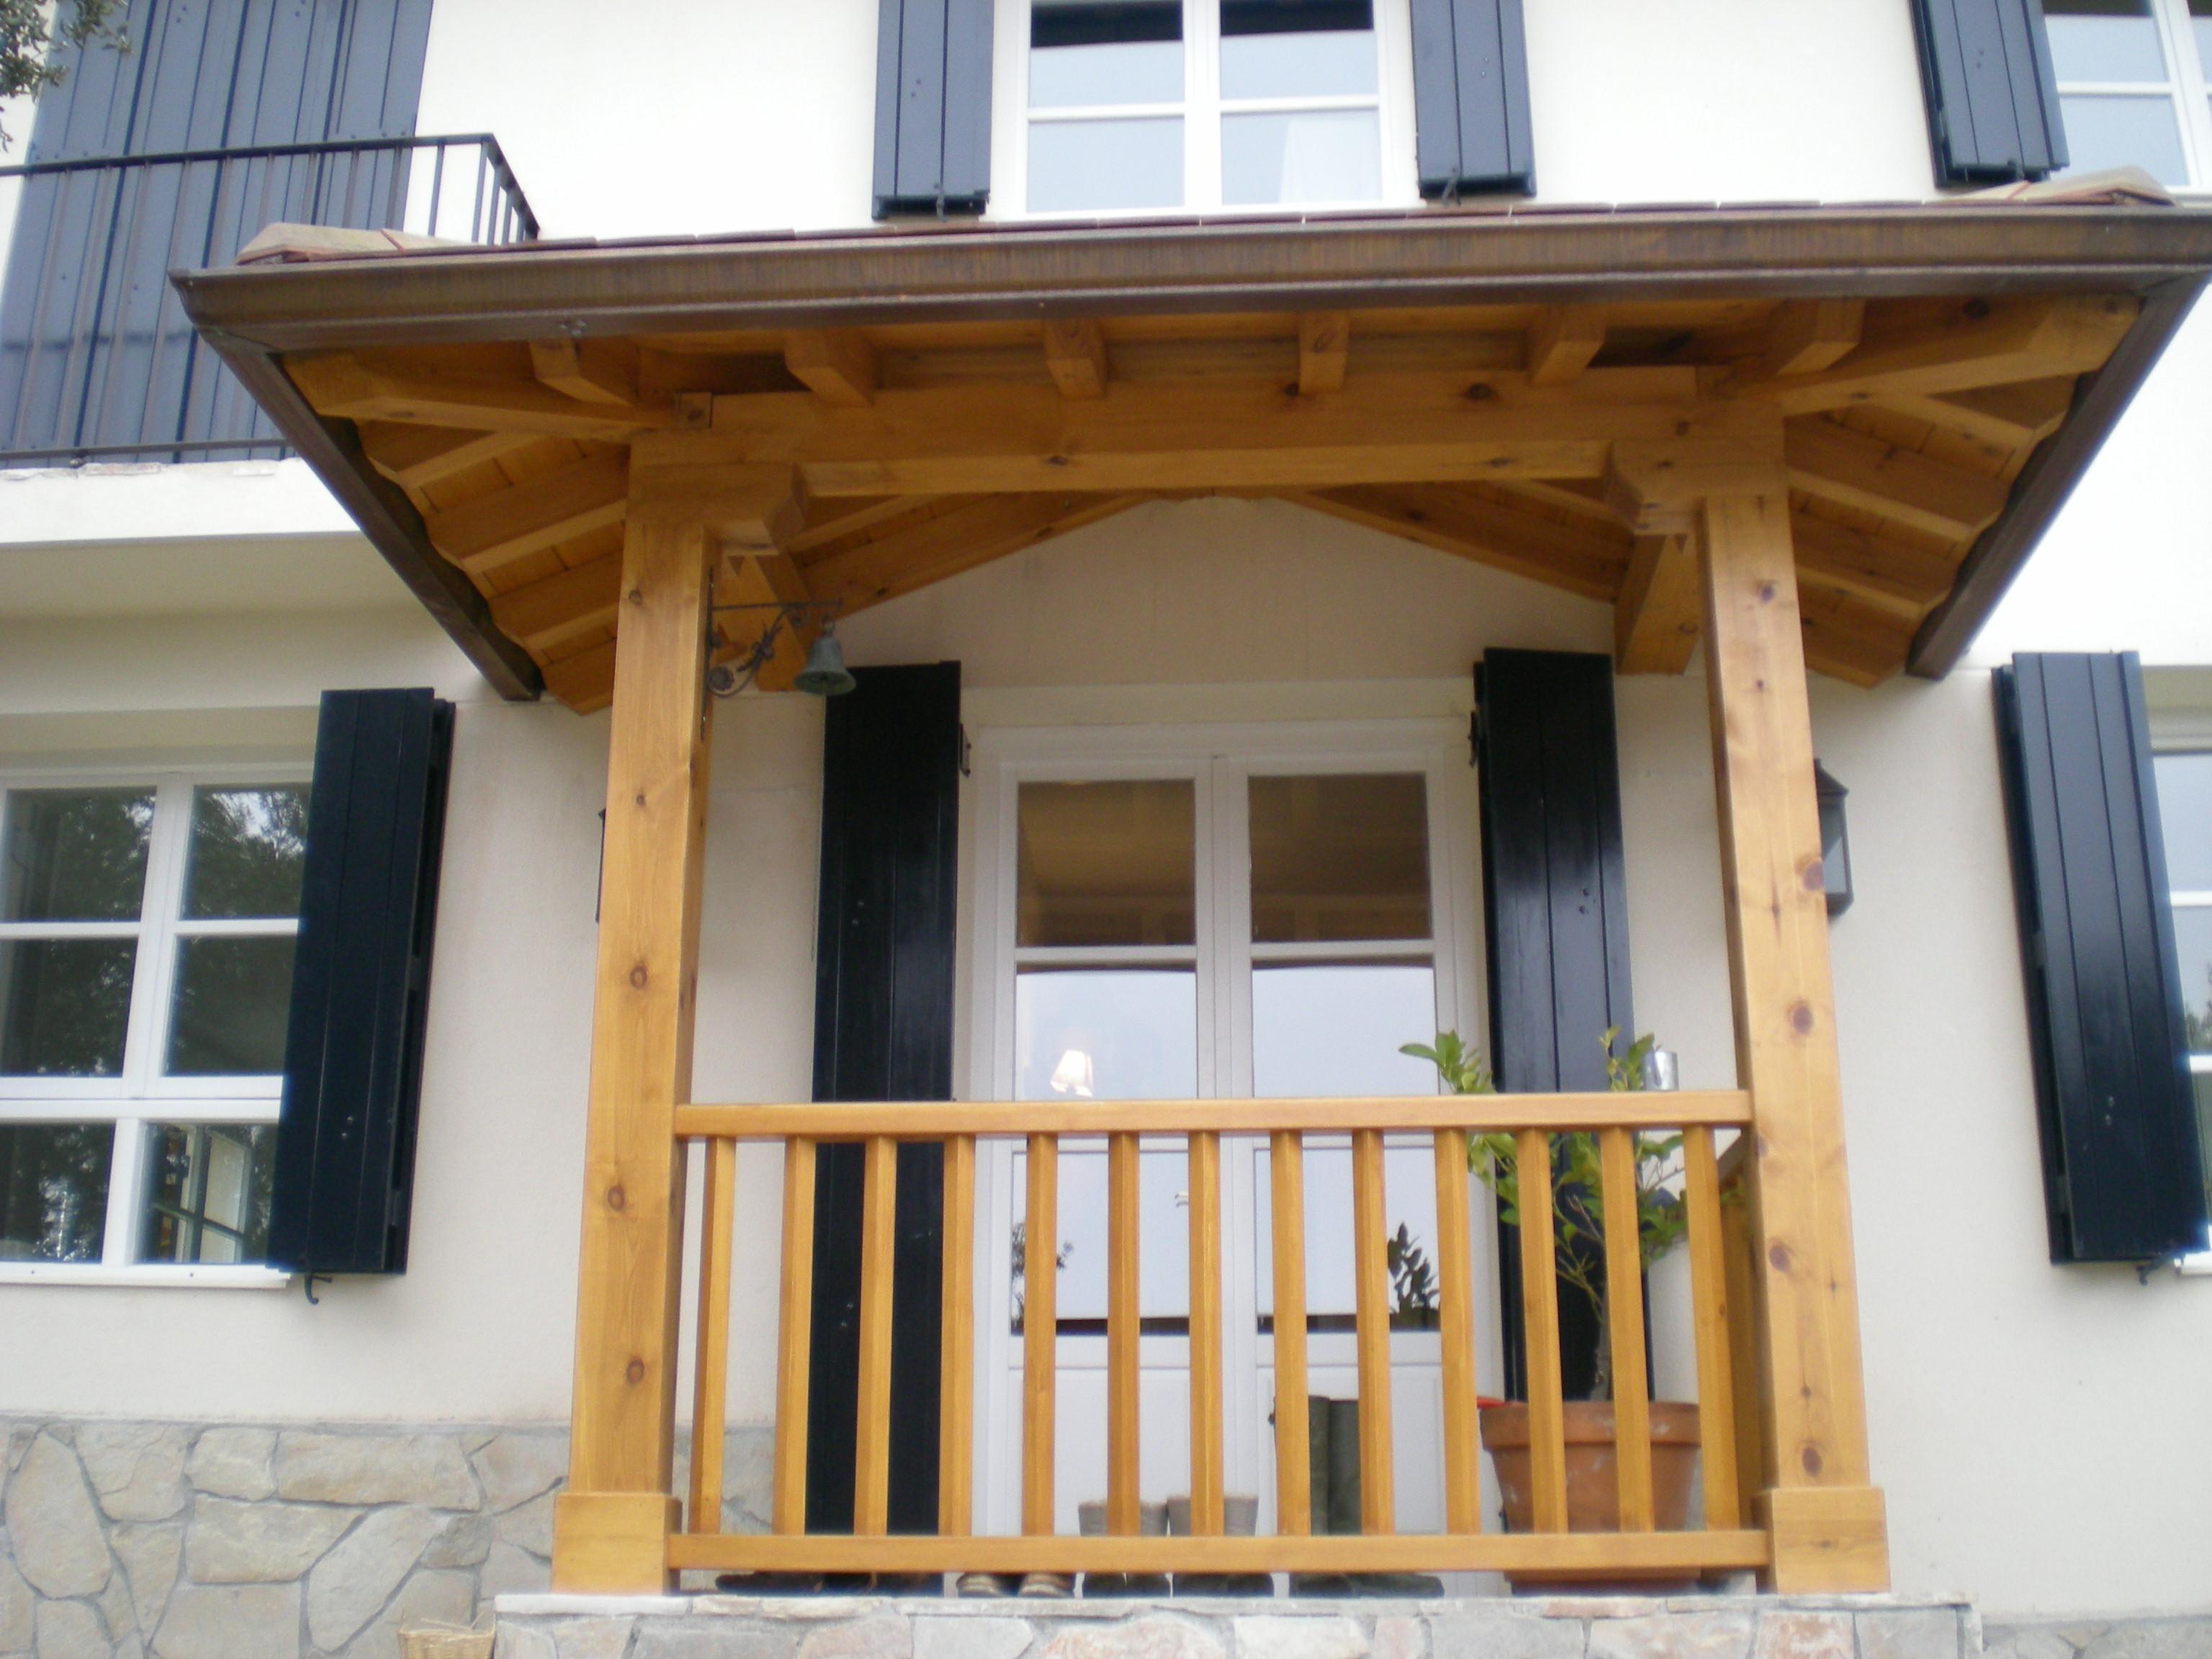 Marquesinas de madera para puertas de entrada puerta for Marquesinas para puertas